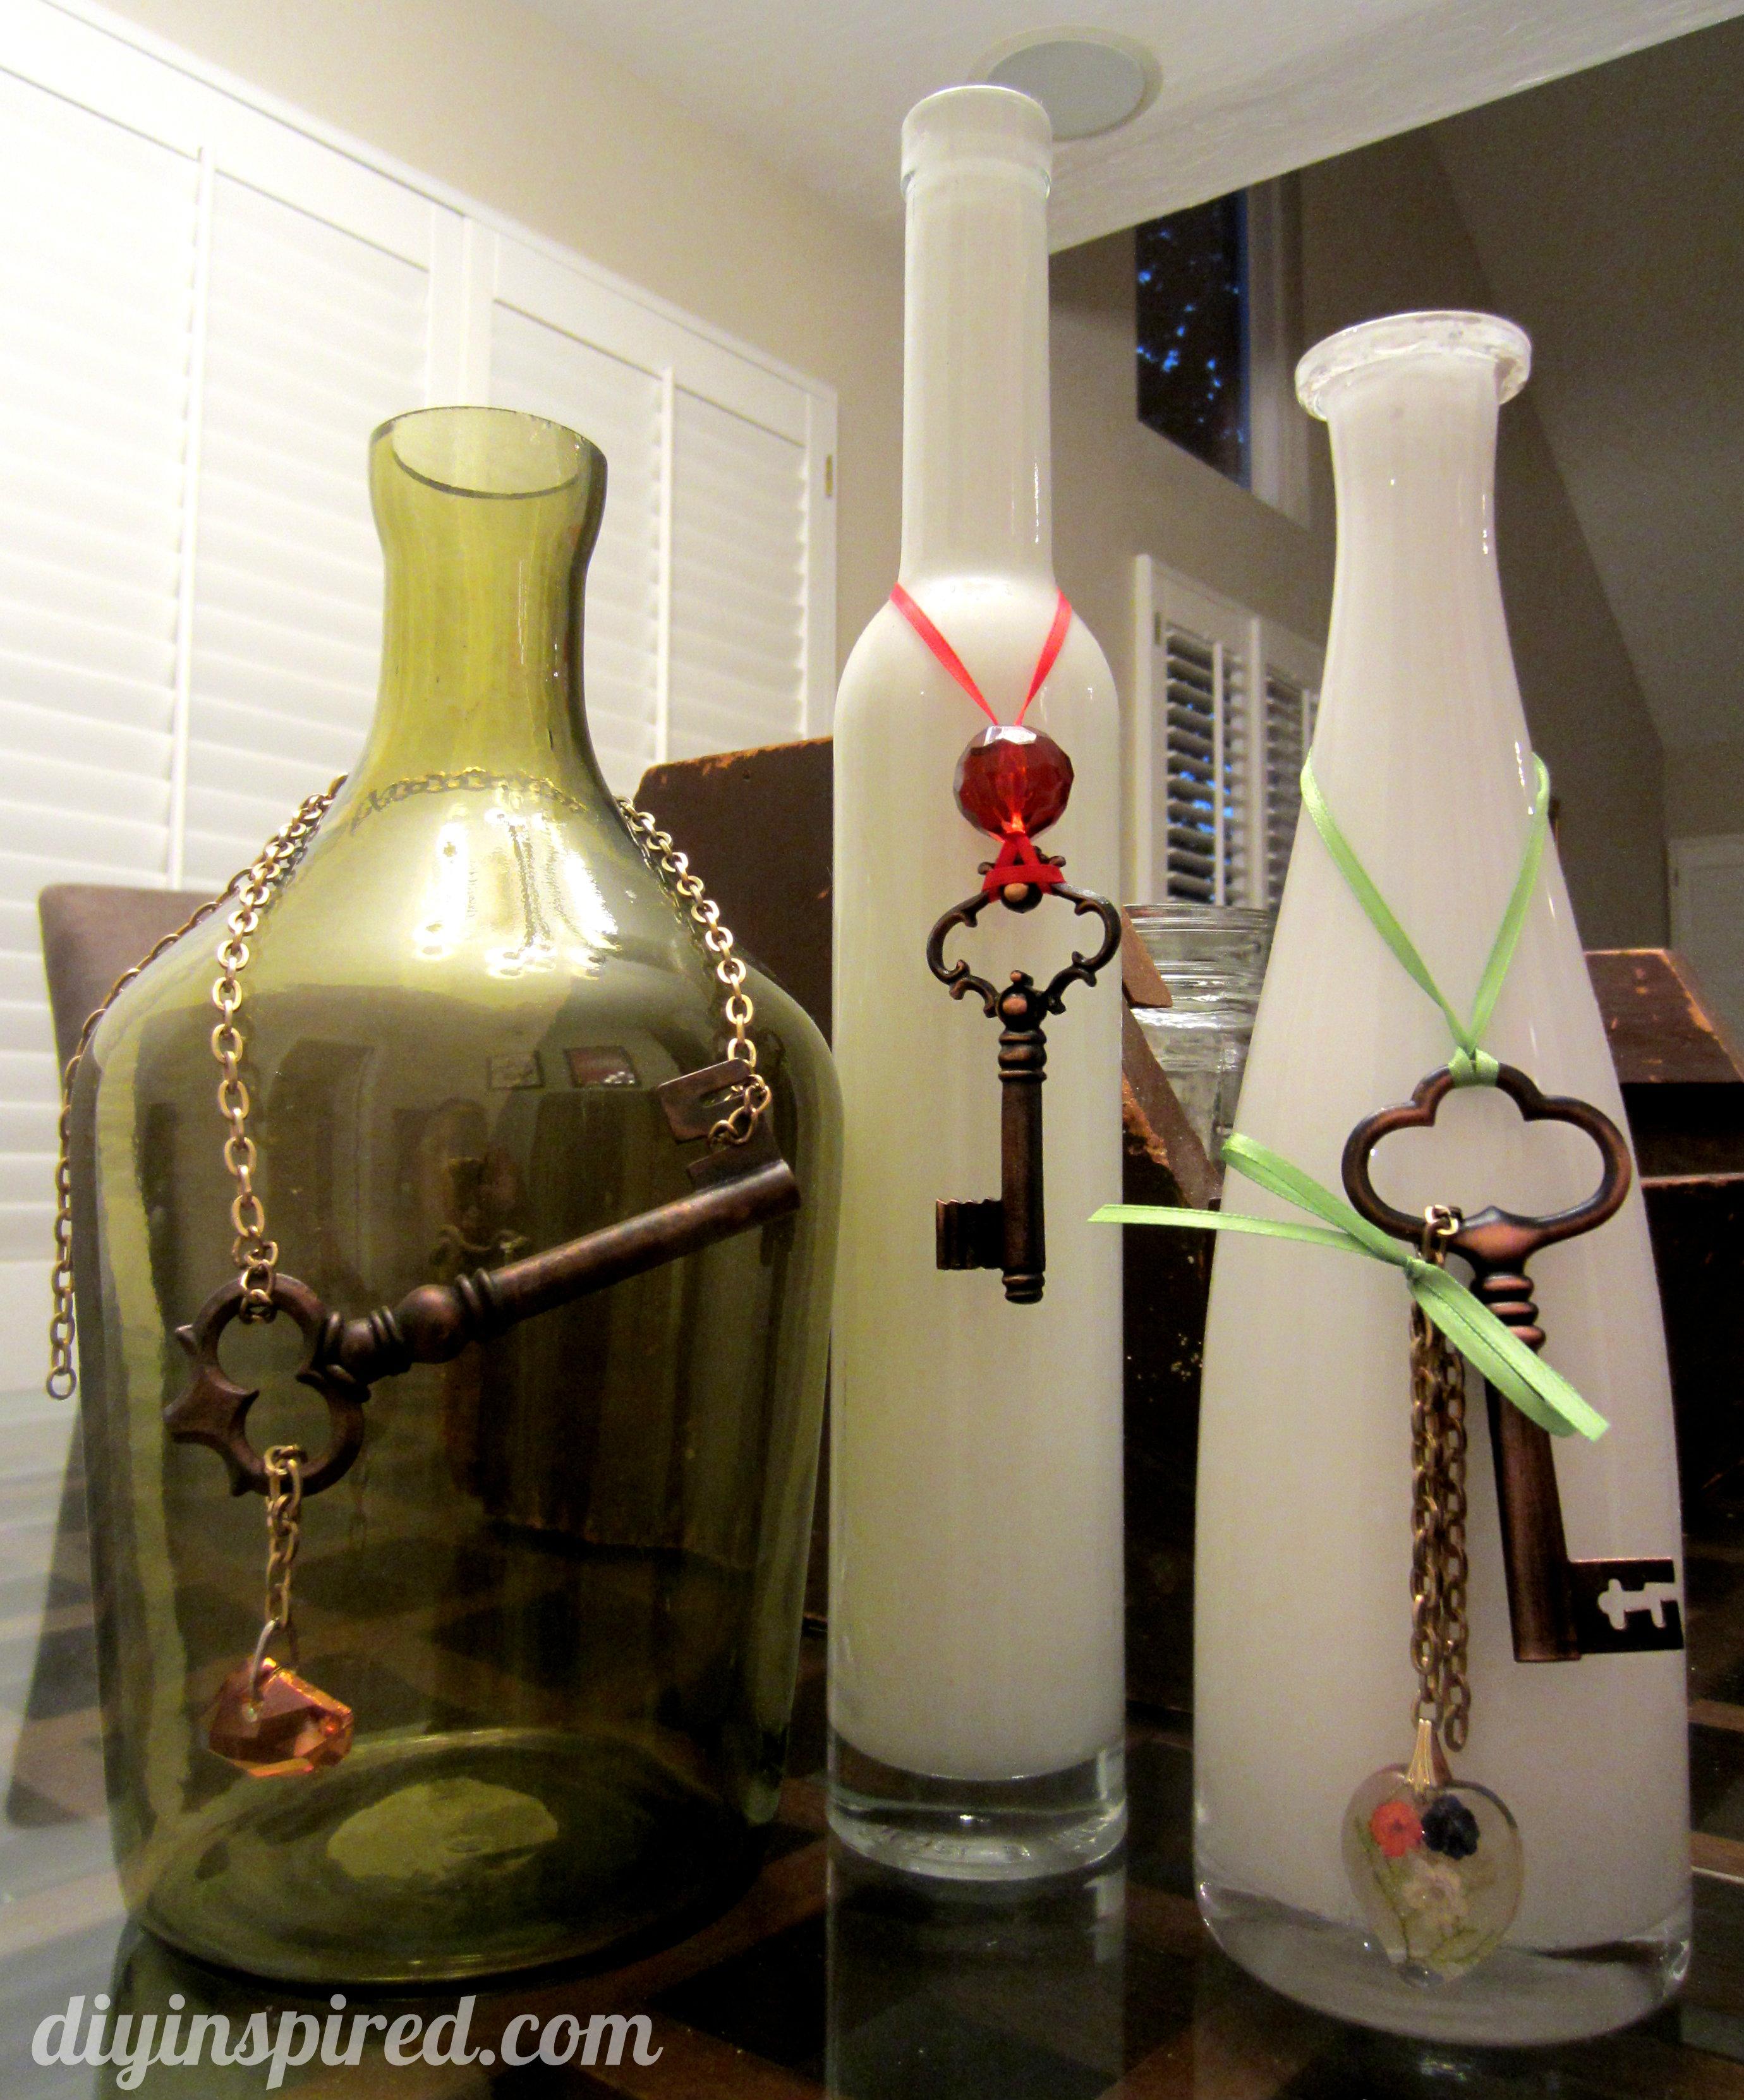 Skeleton Key Crafts